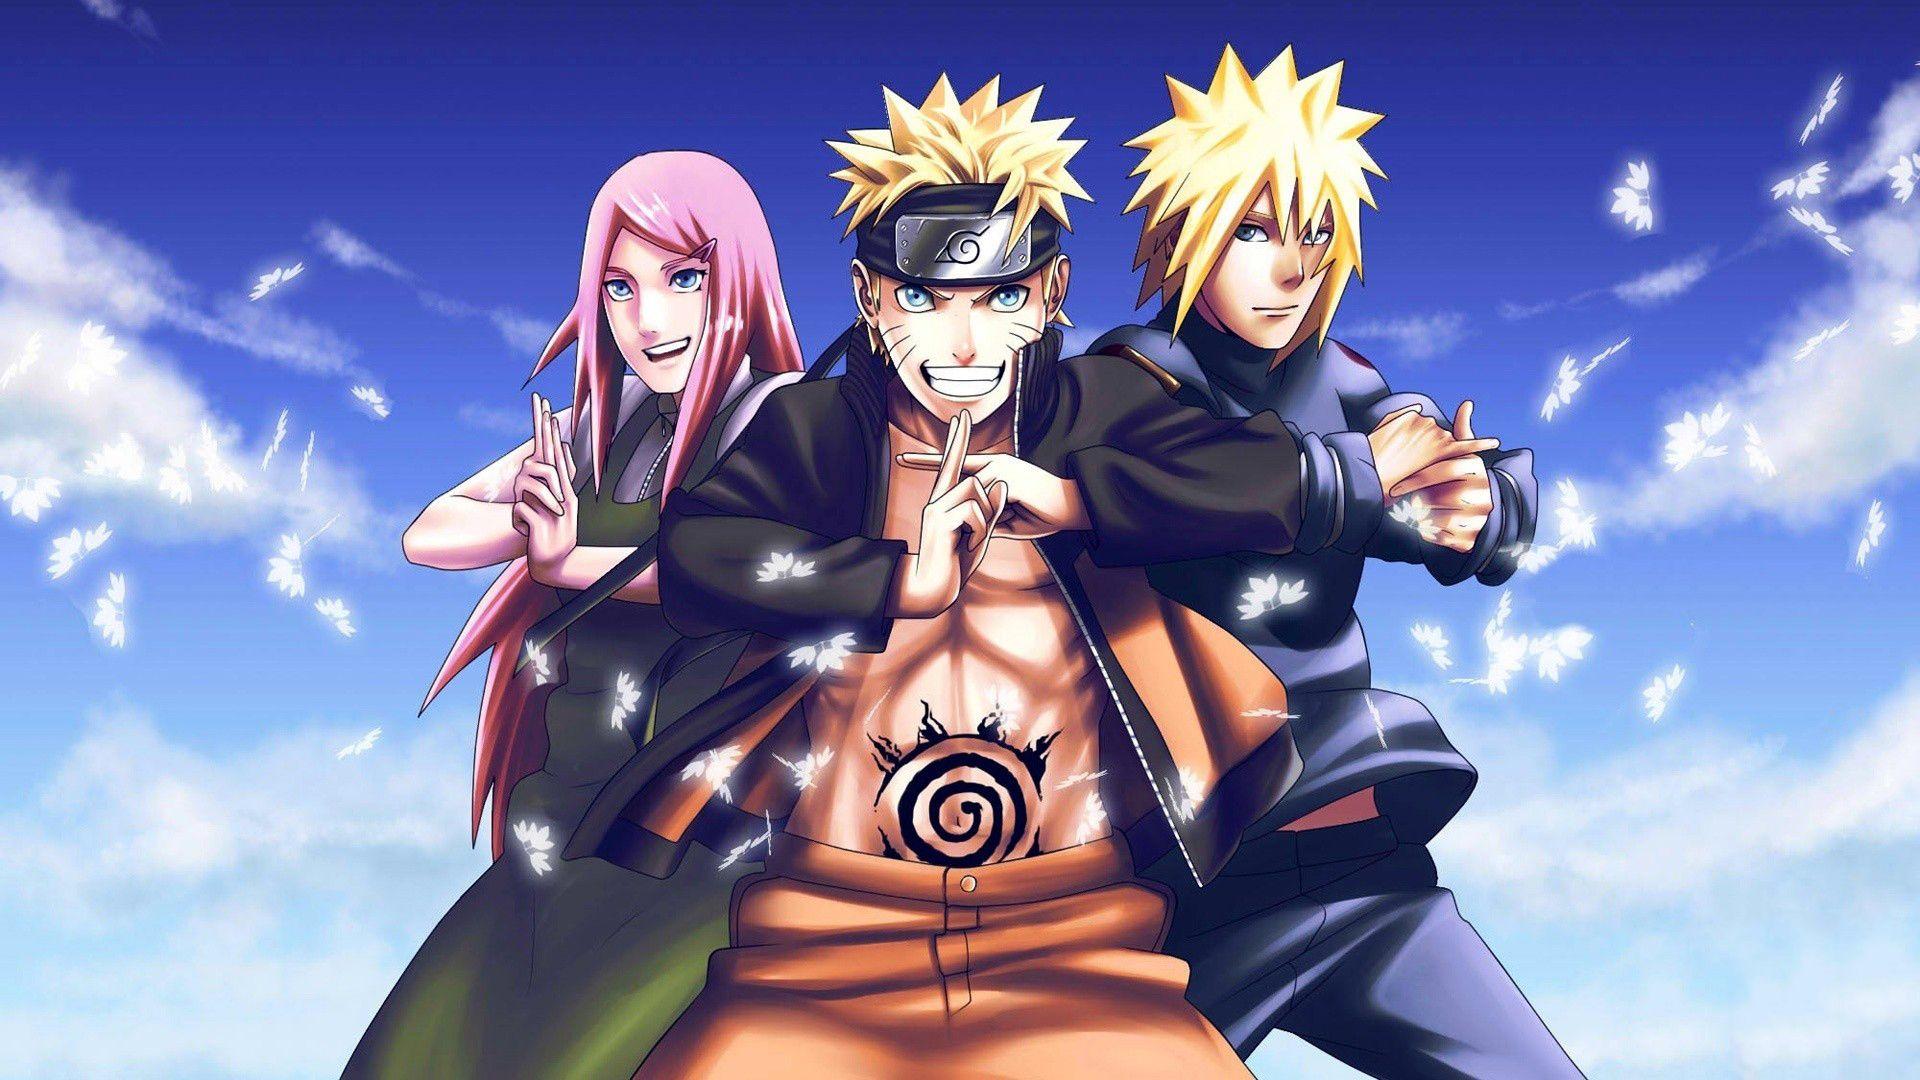 Anime Naruto Naruto Uzumaki Kushina Uzumaki Minato Namikaze